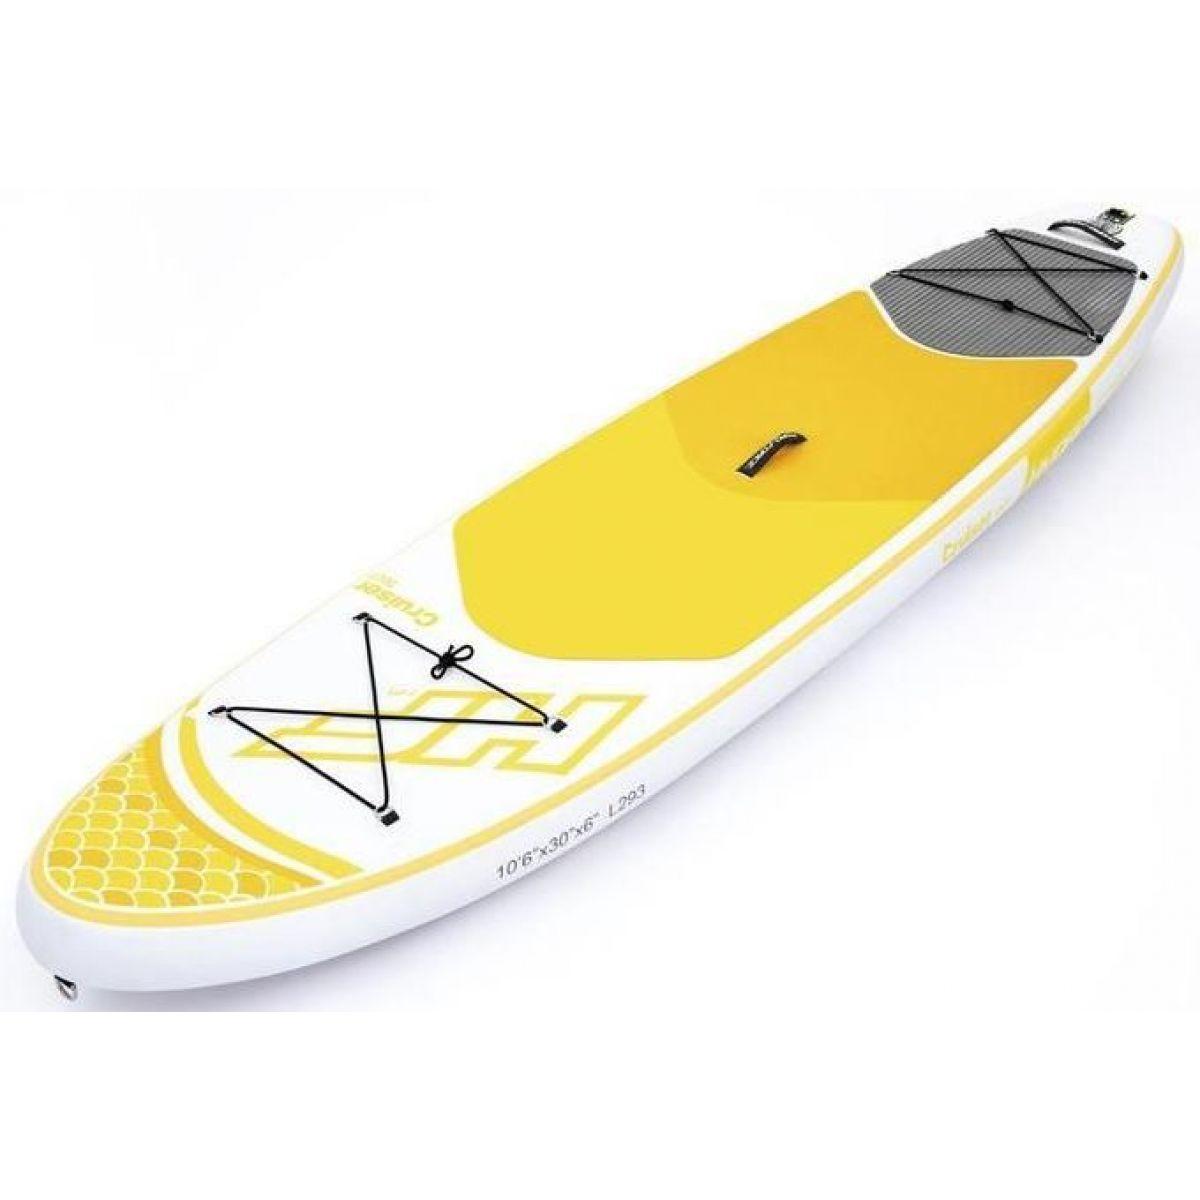 Bestway Paddleboard Cruiser Tech 320 x 76 x 15 cm